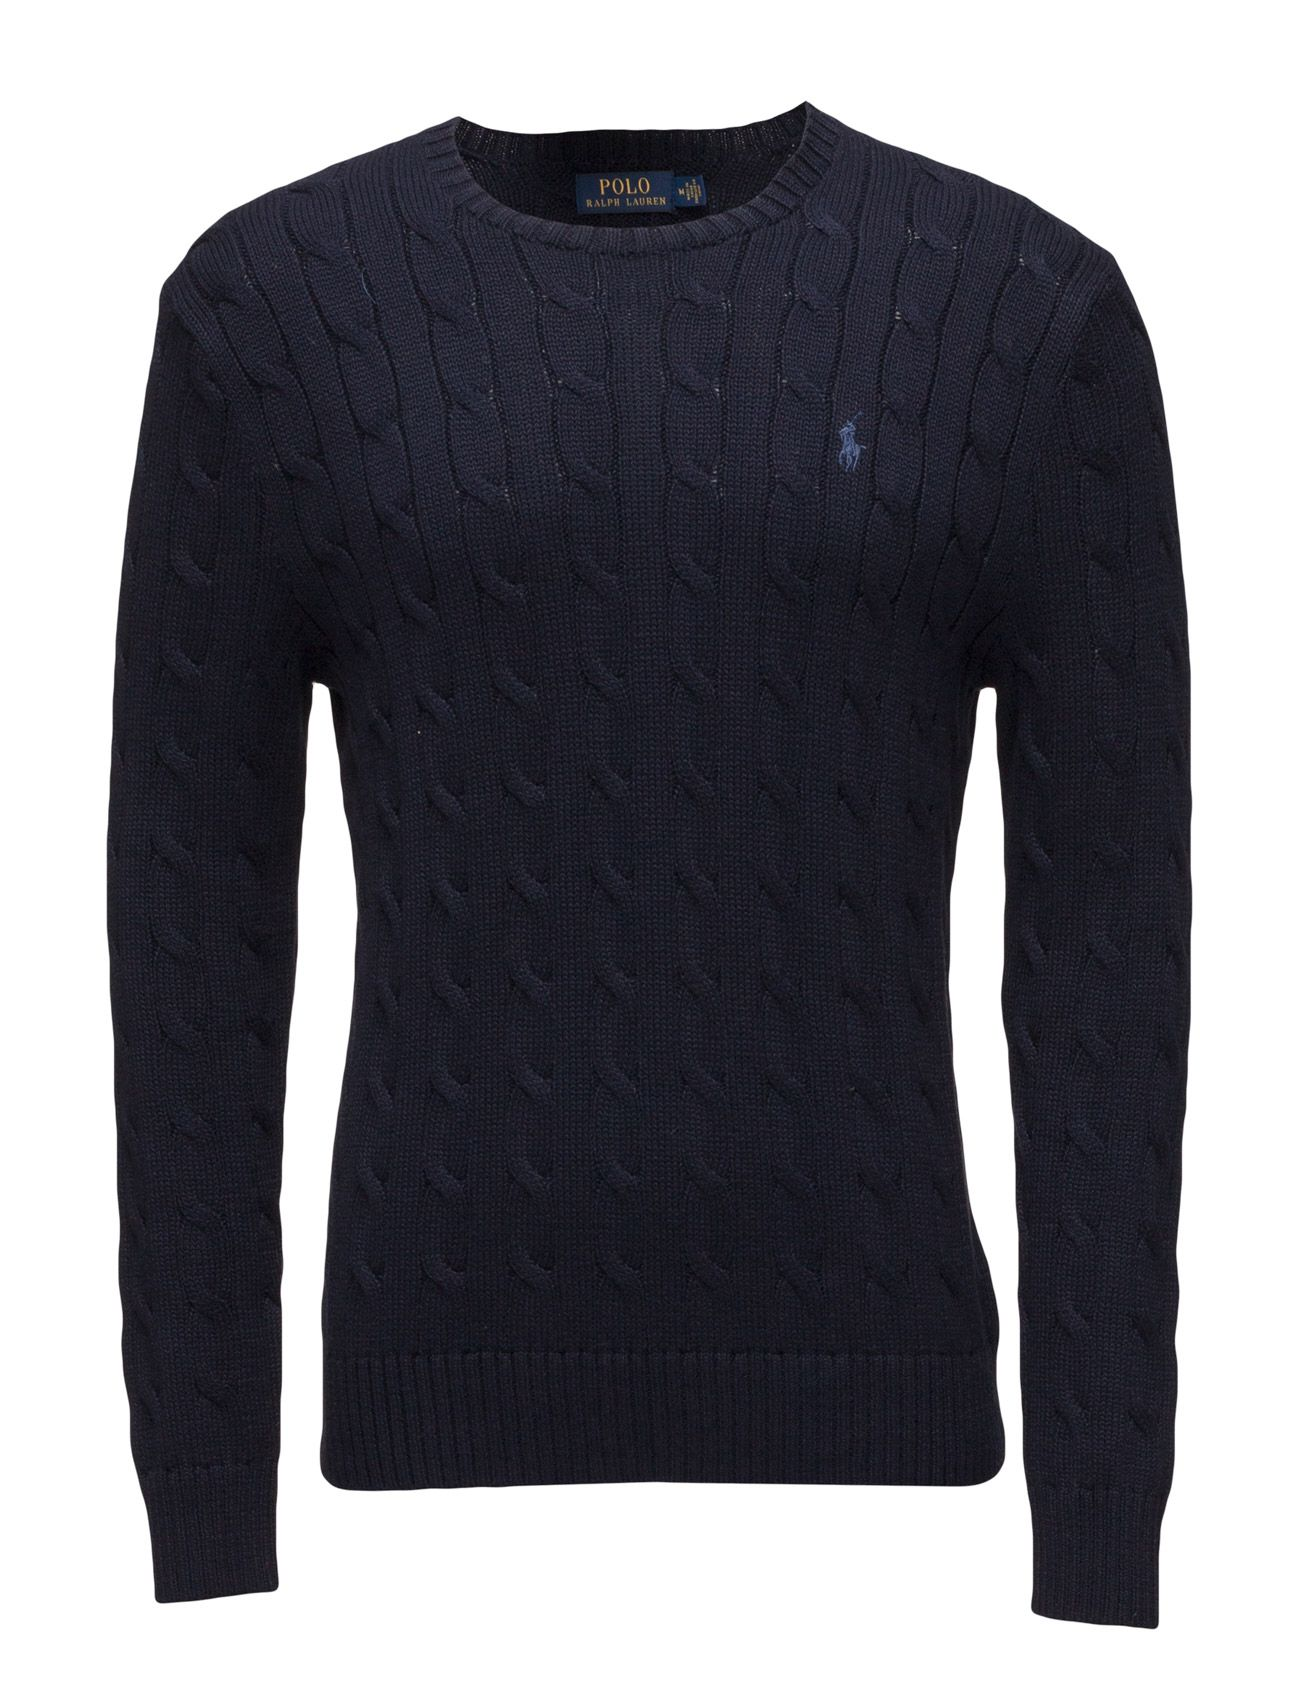 16090ee05 polo ralph lauren cable-knit cotton sweater hunter navy men tops knitwear round  necks